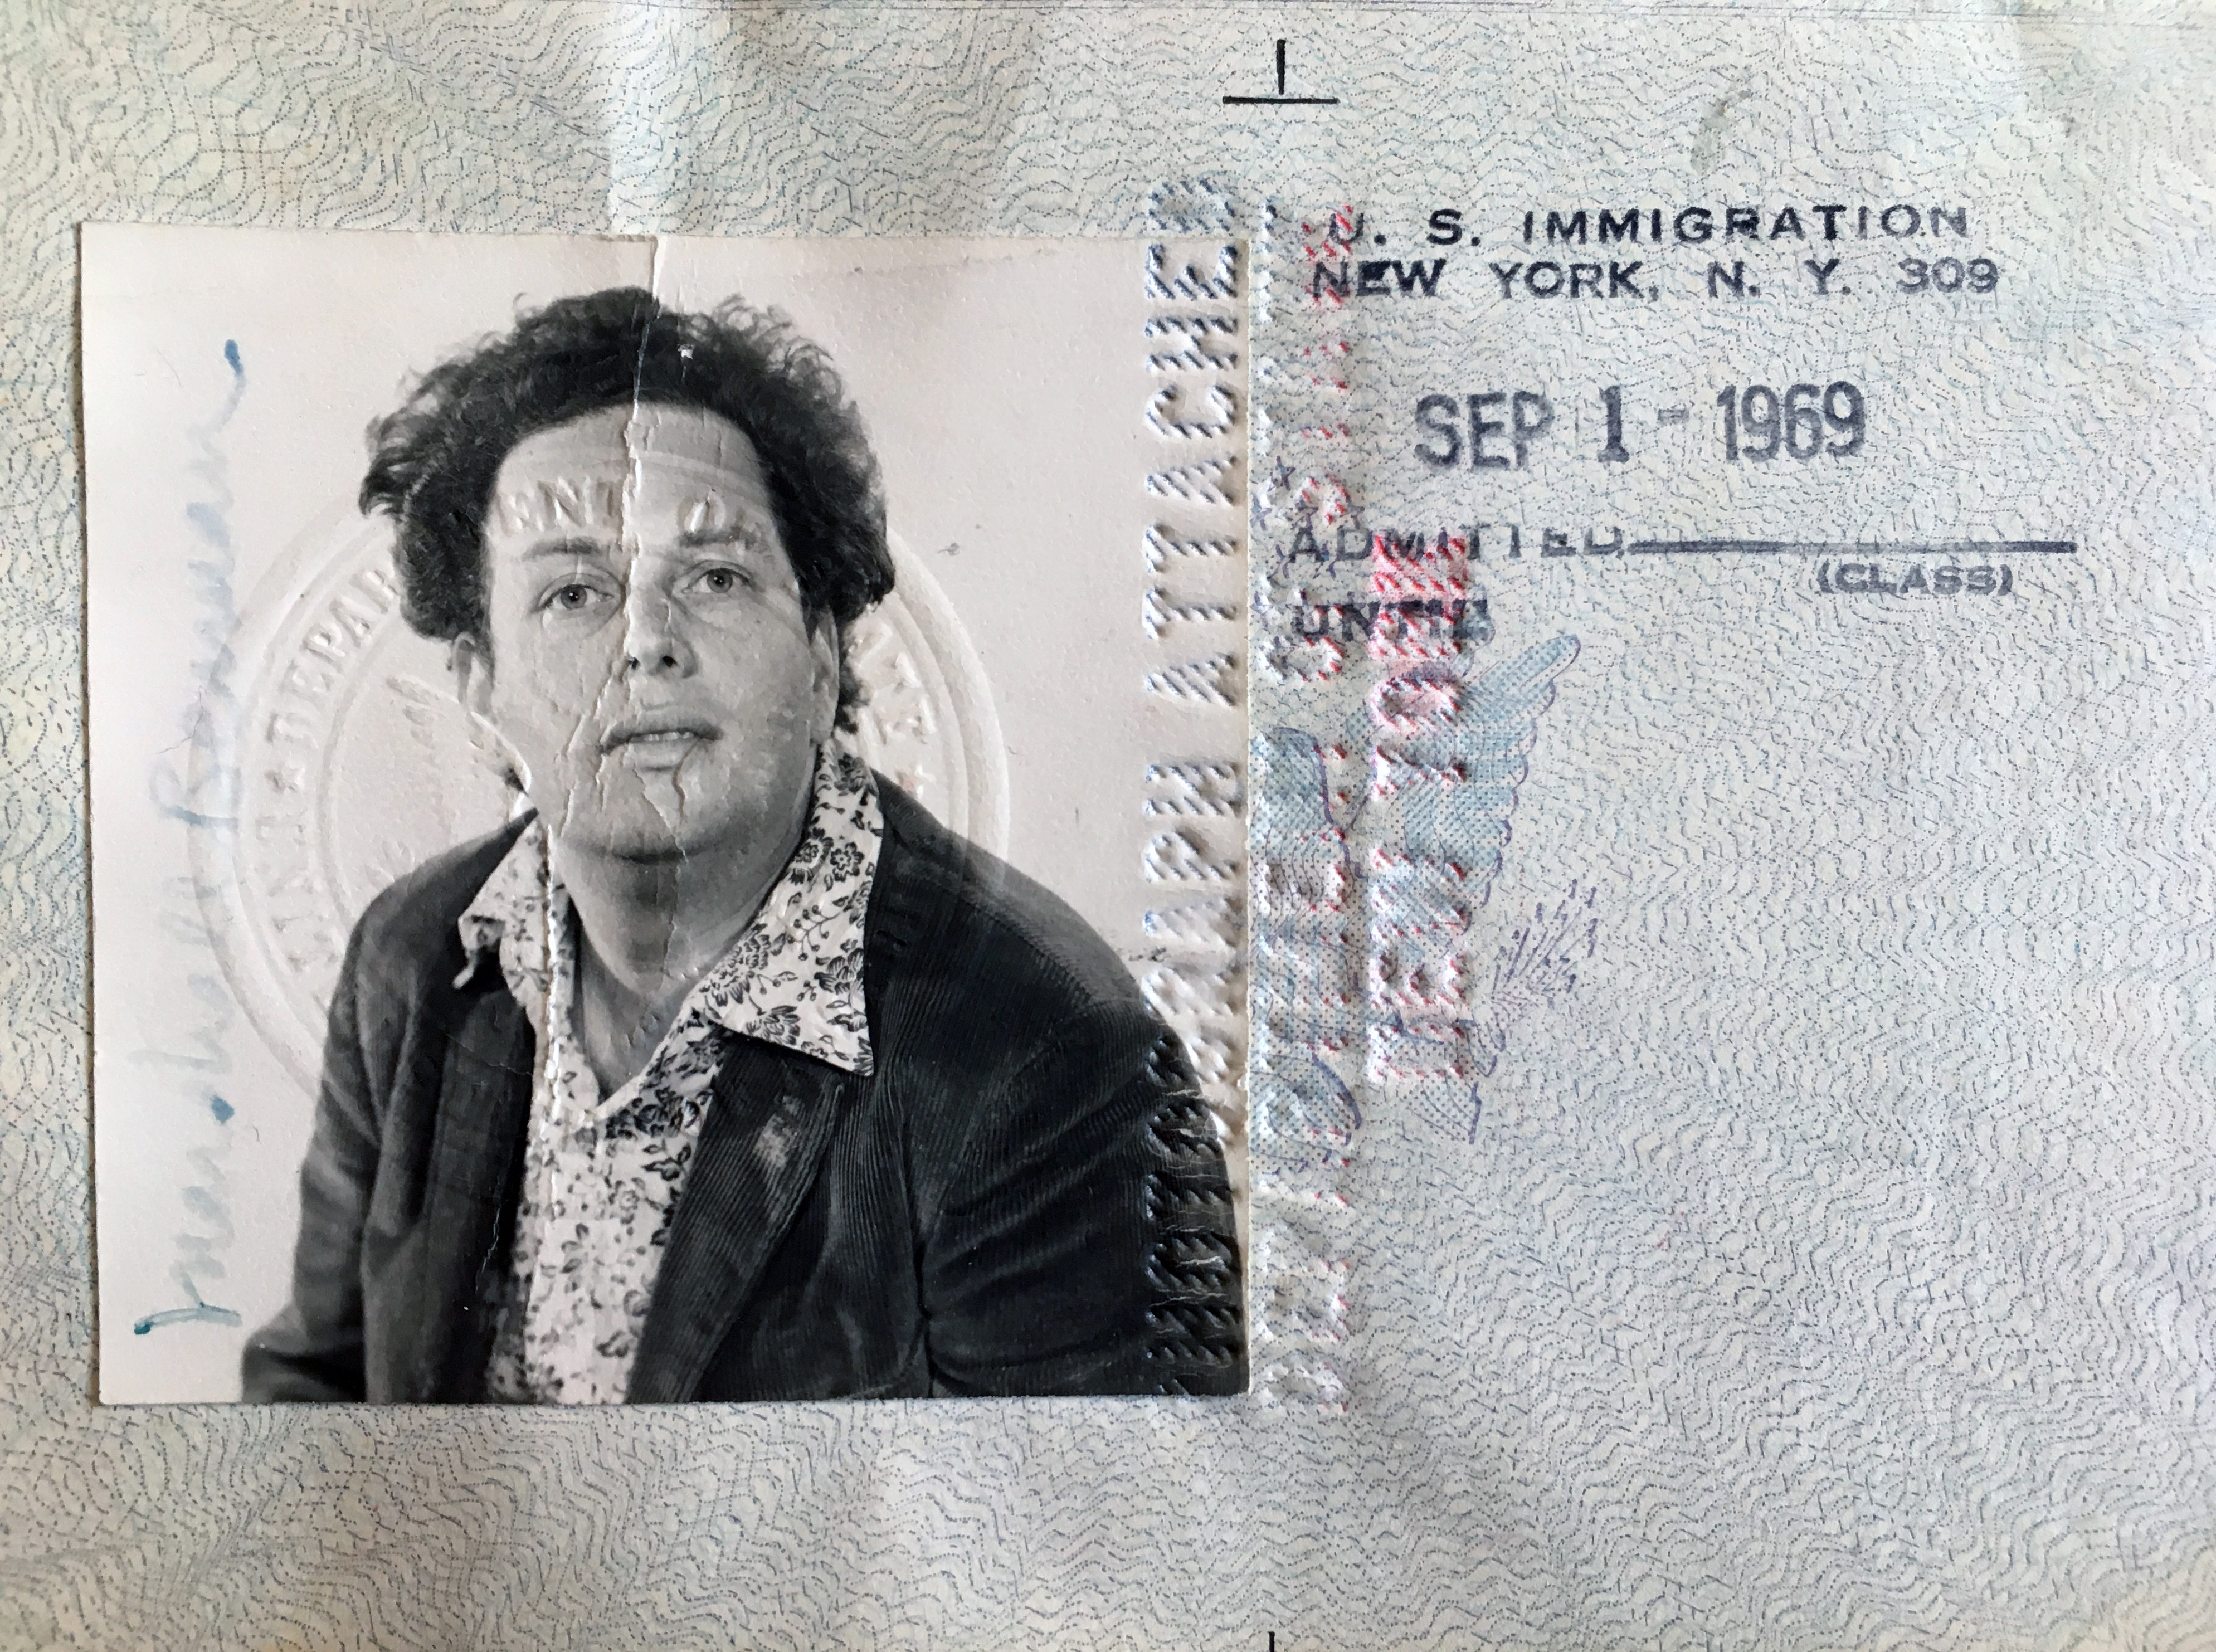 Marshall_berman_1969_passport_page_horizontal_-aaa3ed964ae159d6e5c19f0117c2aabc-